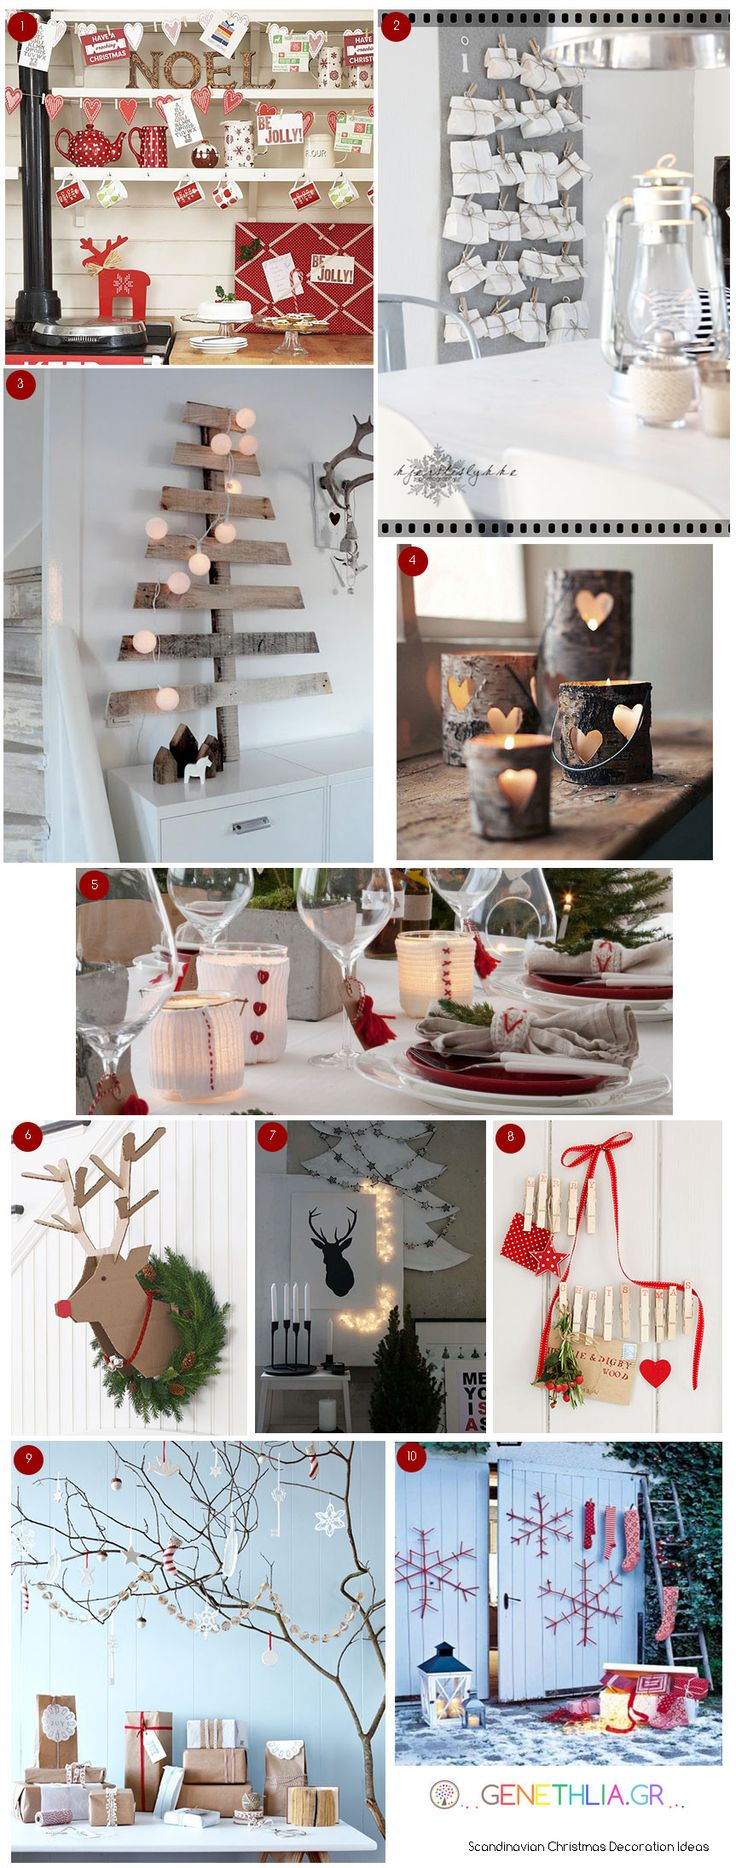 Scandinavian Christmas Decoration!